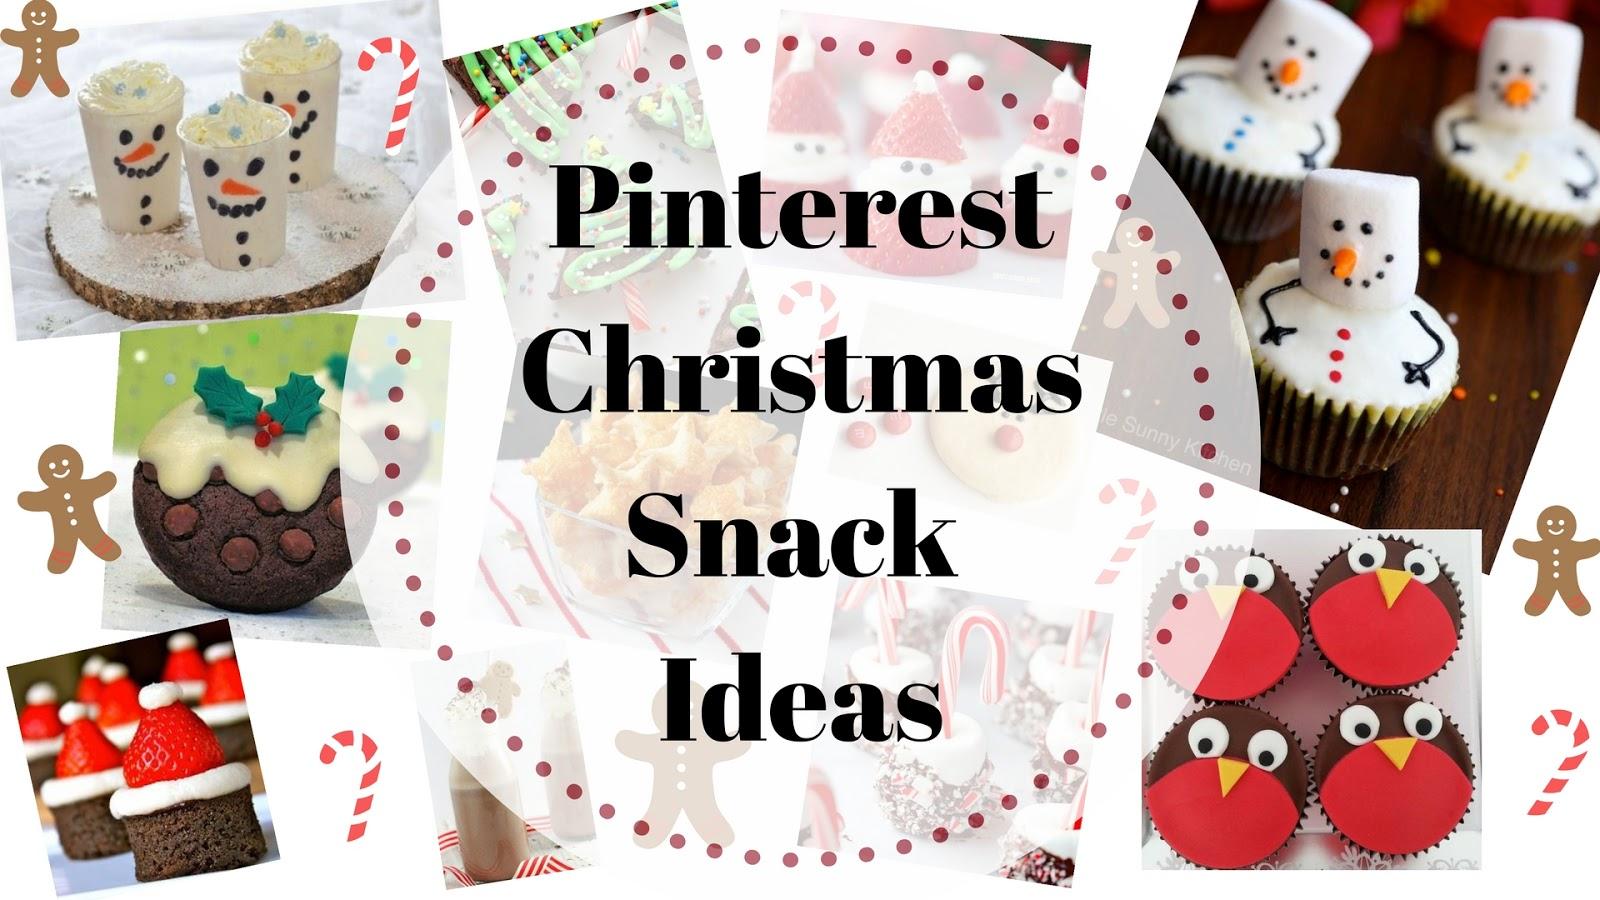 Pinterest Christmas Snack Ideas